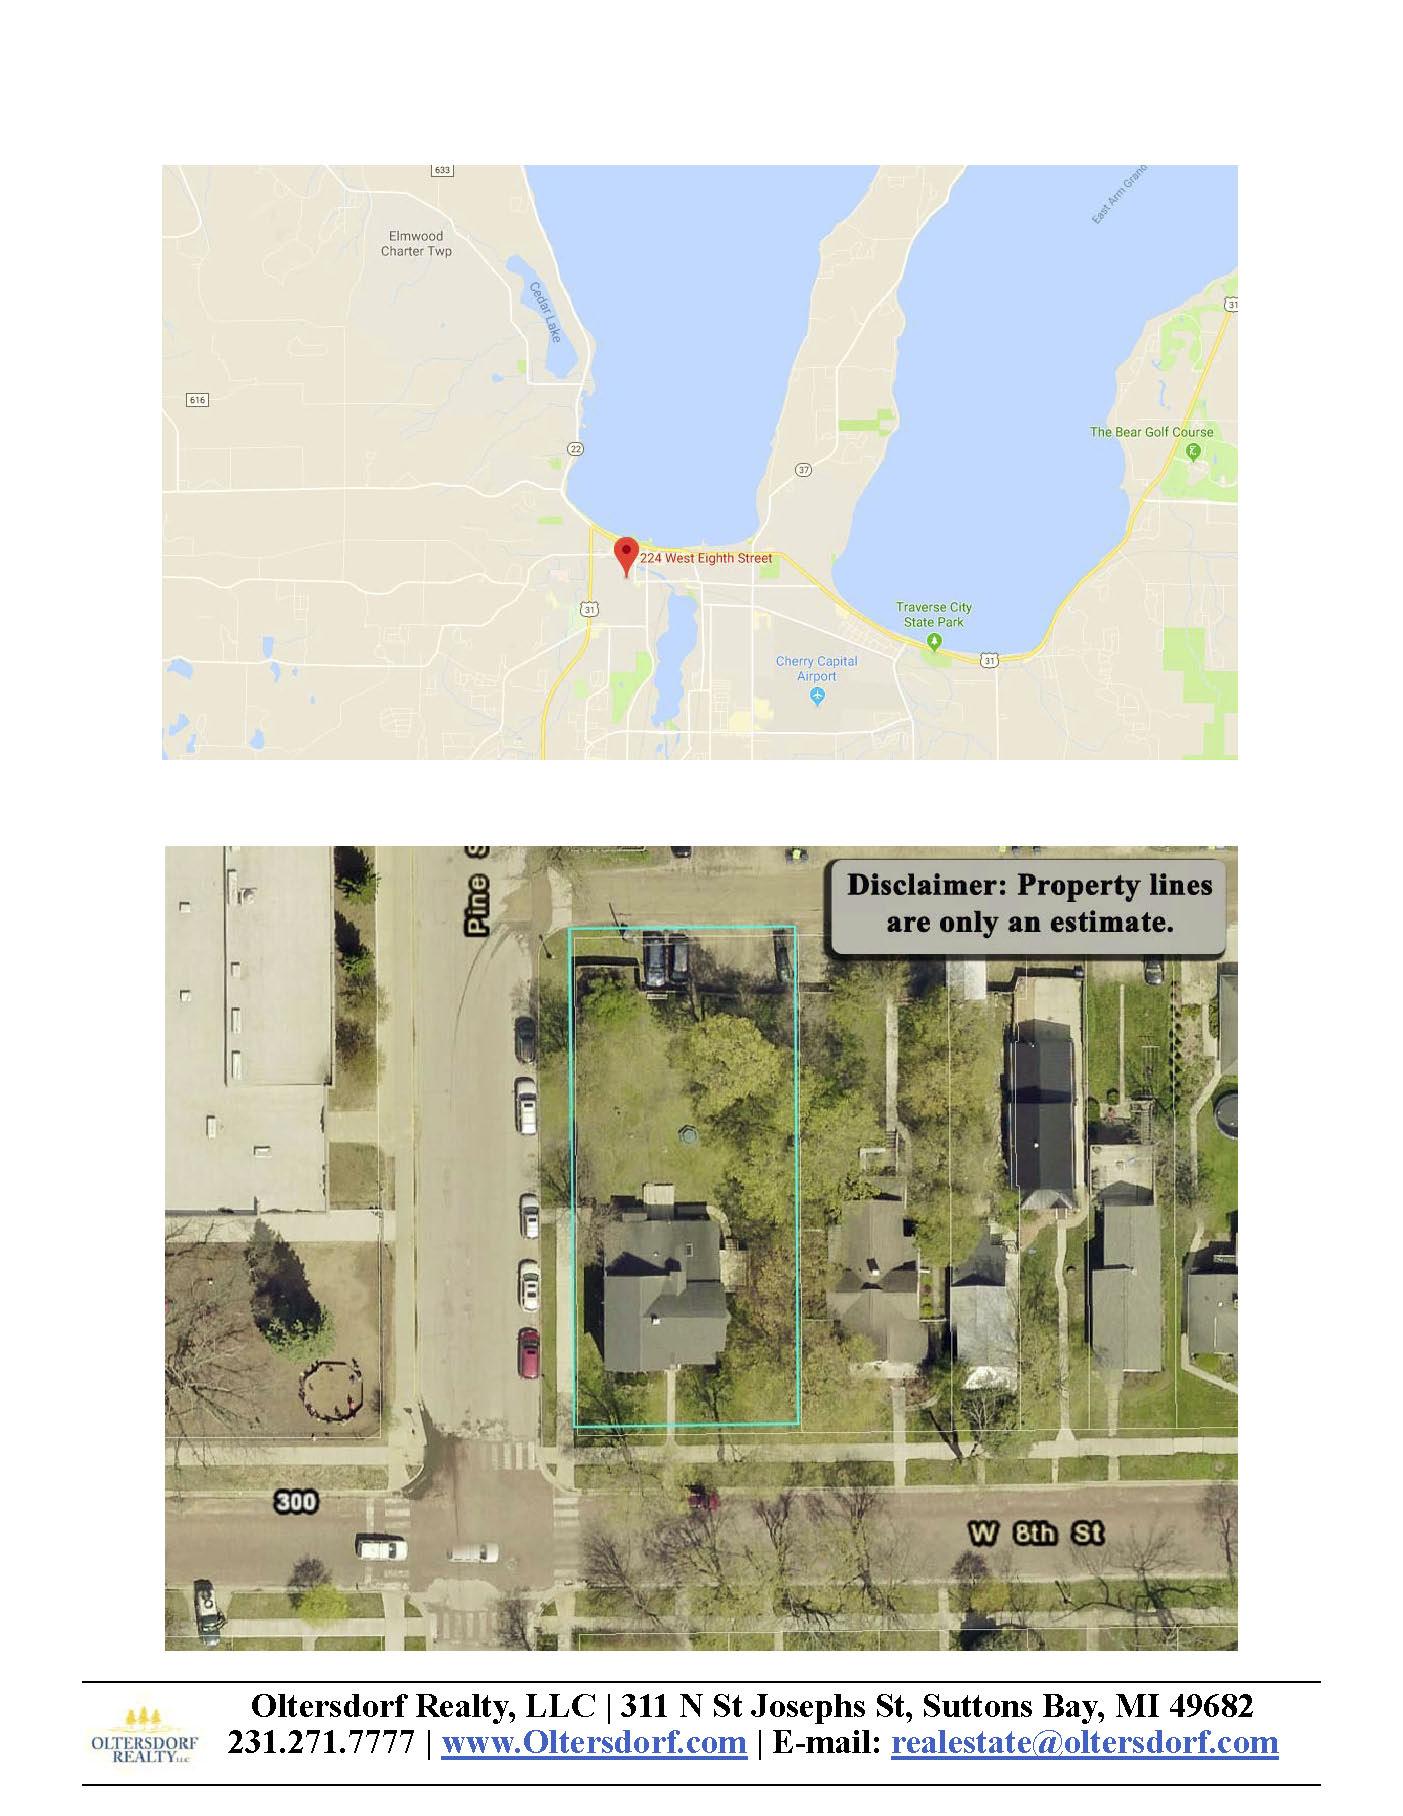 224 W Eighth St, Traverse City, MI – Downtown Traverse City Triplex Marketing Packet - For sale by Oltersdorf Realty LLC (11).jpg